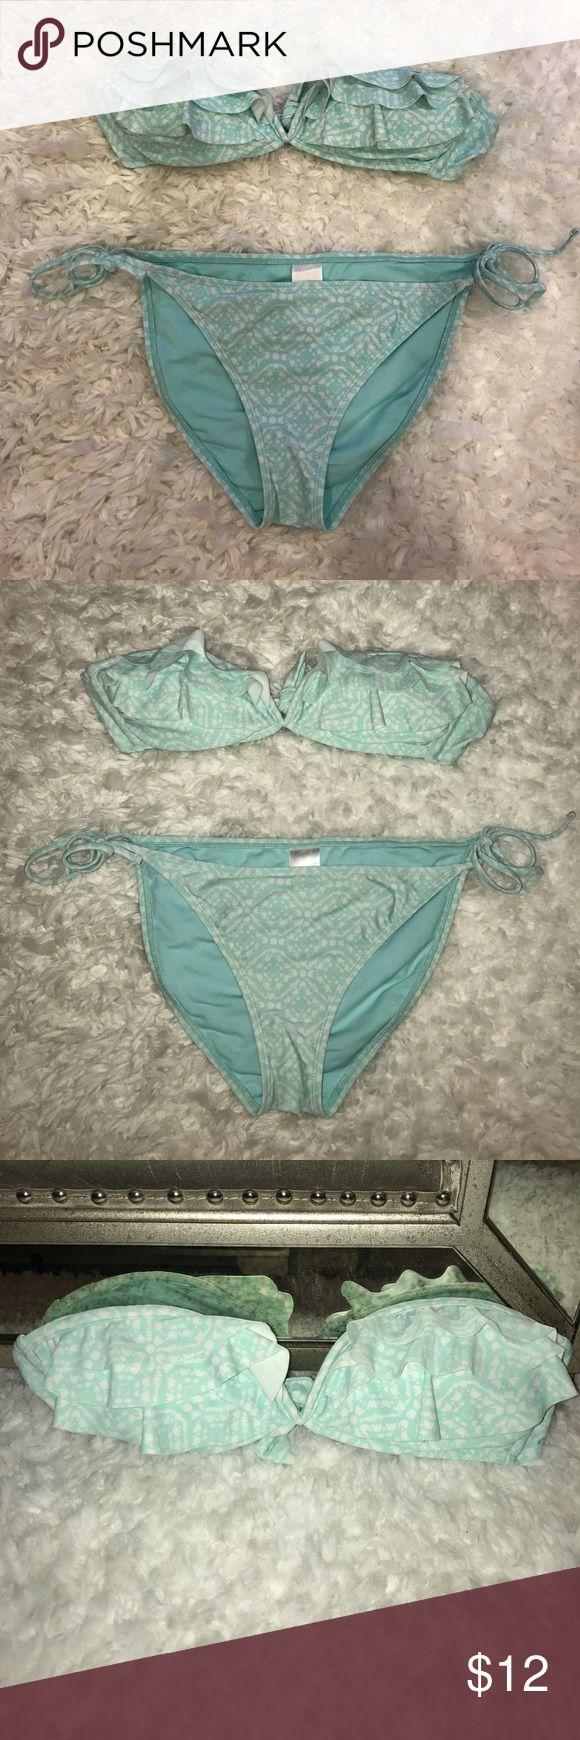 Teal Tube Top Bikini Gently worn. Very summery and cute two piece bikini. Tube top can be strapped around neck. Xhilaration Swim Bikinis